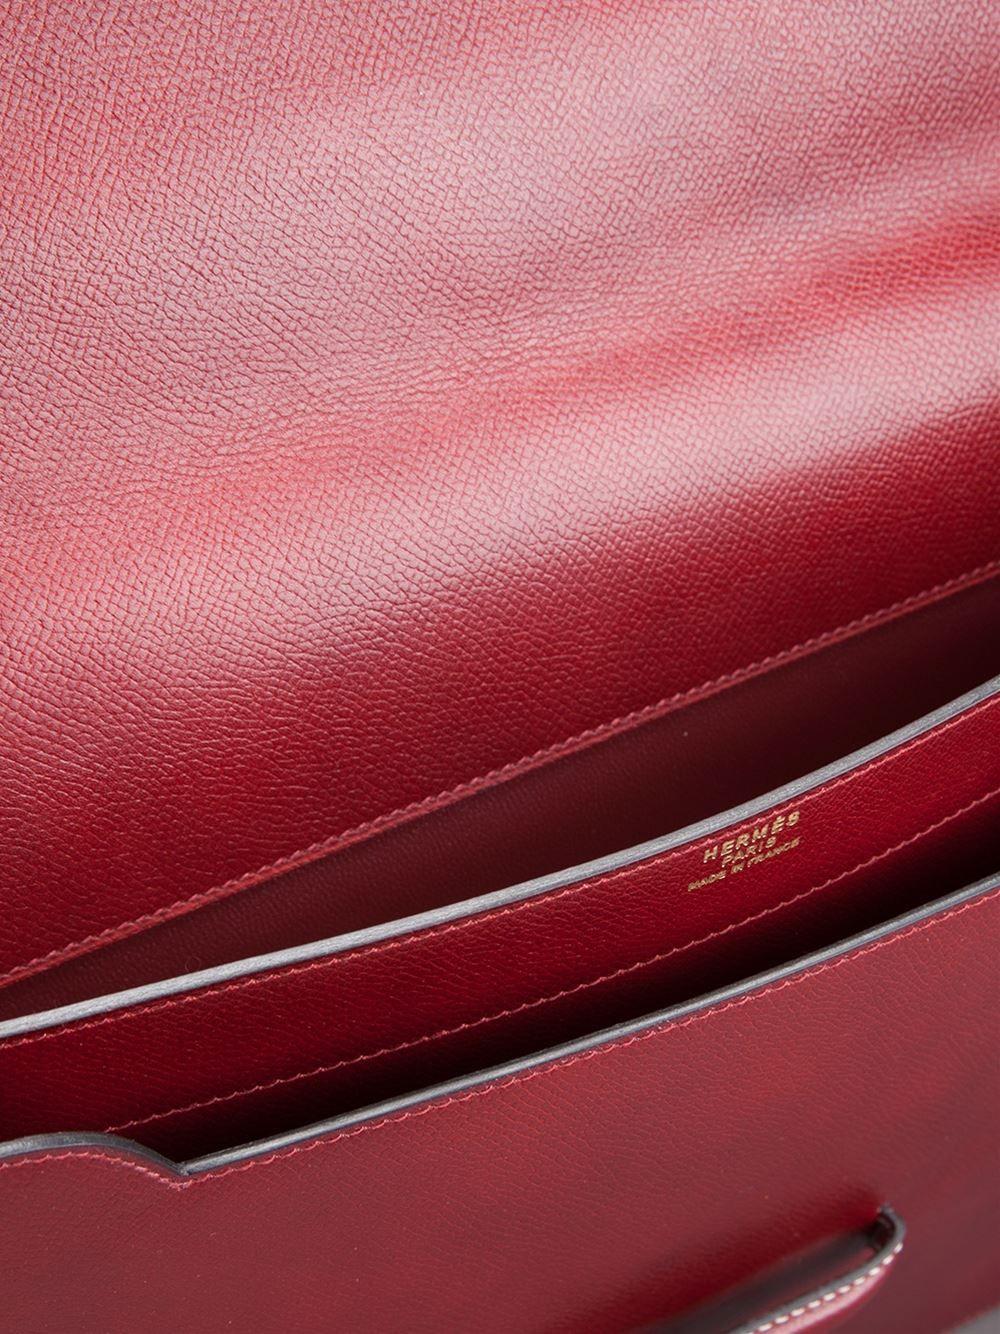 Hermès Vintage \'Marco Polo Club\' clutch | 클러치백 | Pinterest ...